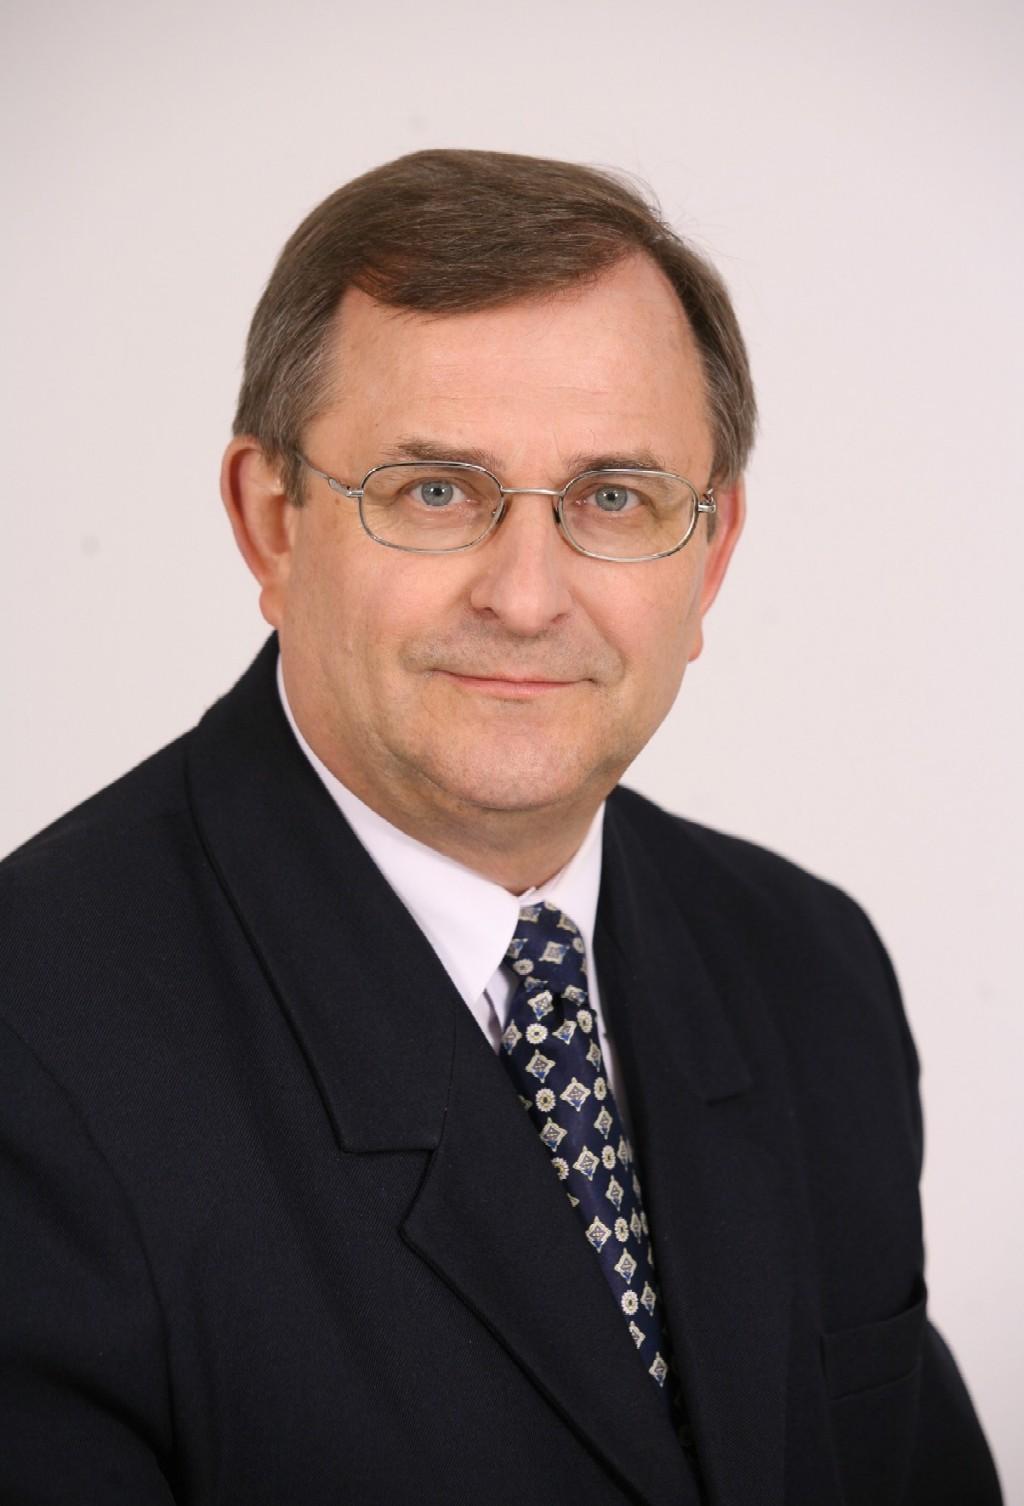 Andrzej Siborenko